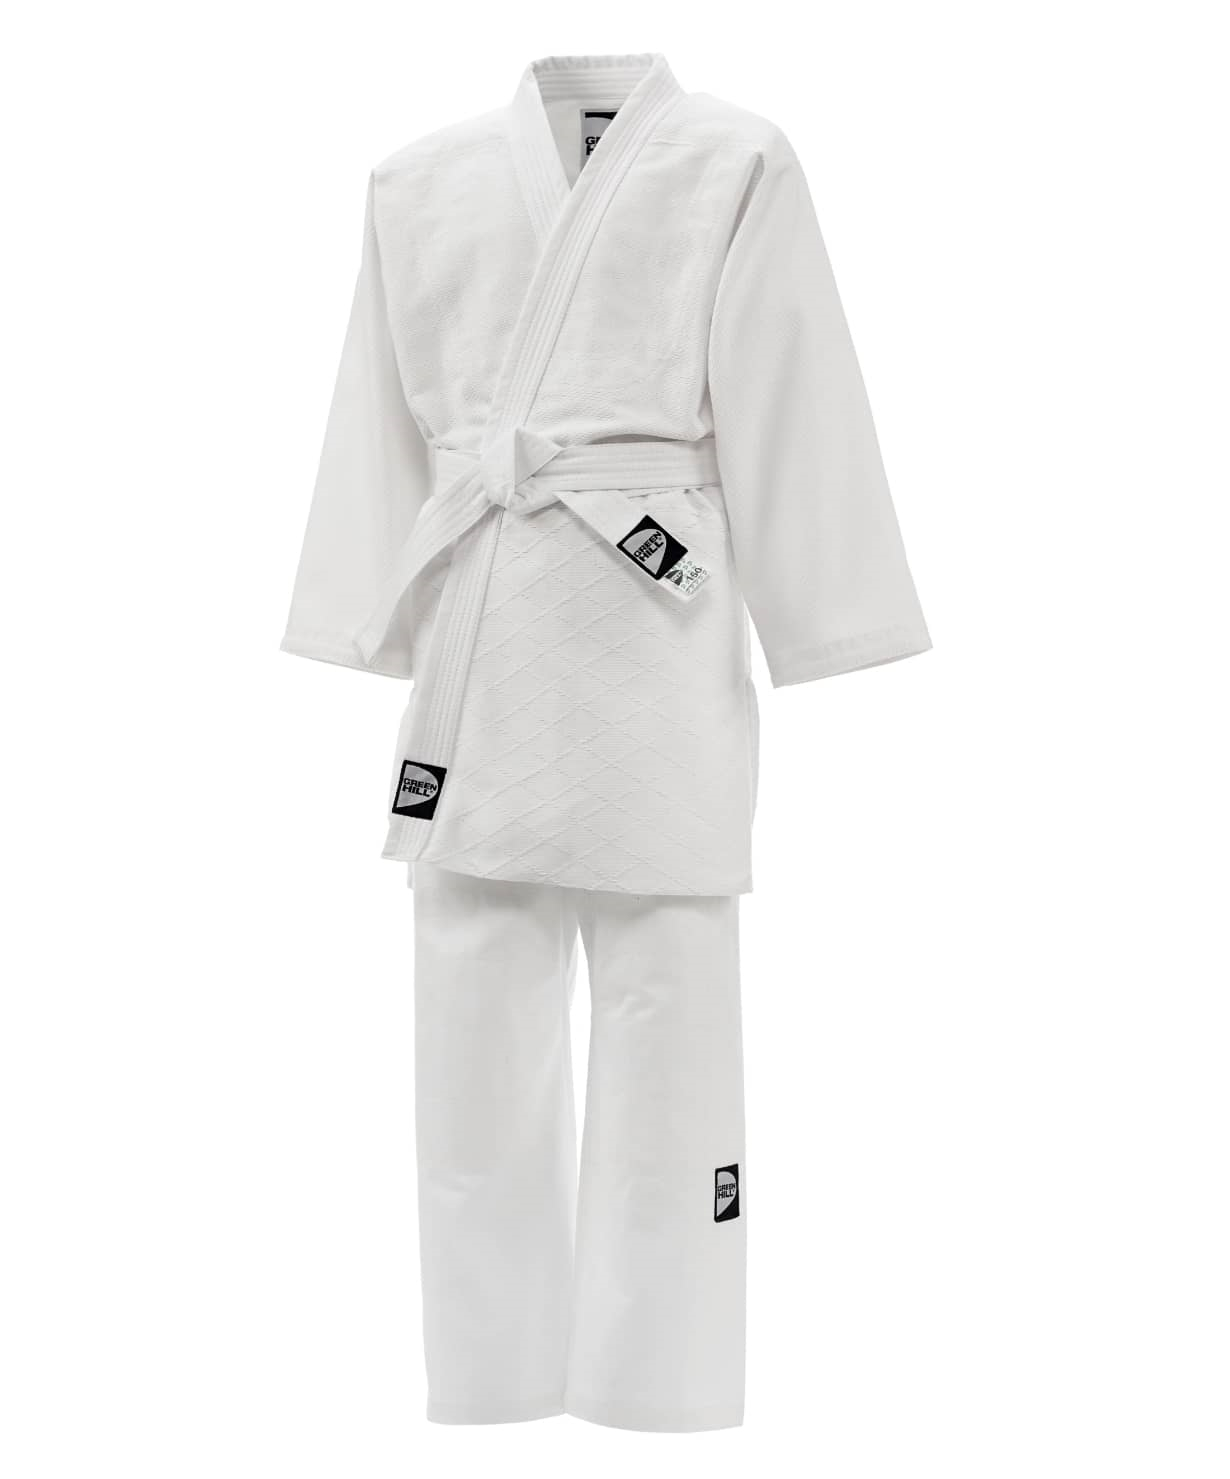 Кимоно для дзюдо JSST-10572, белый, р.3/160